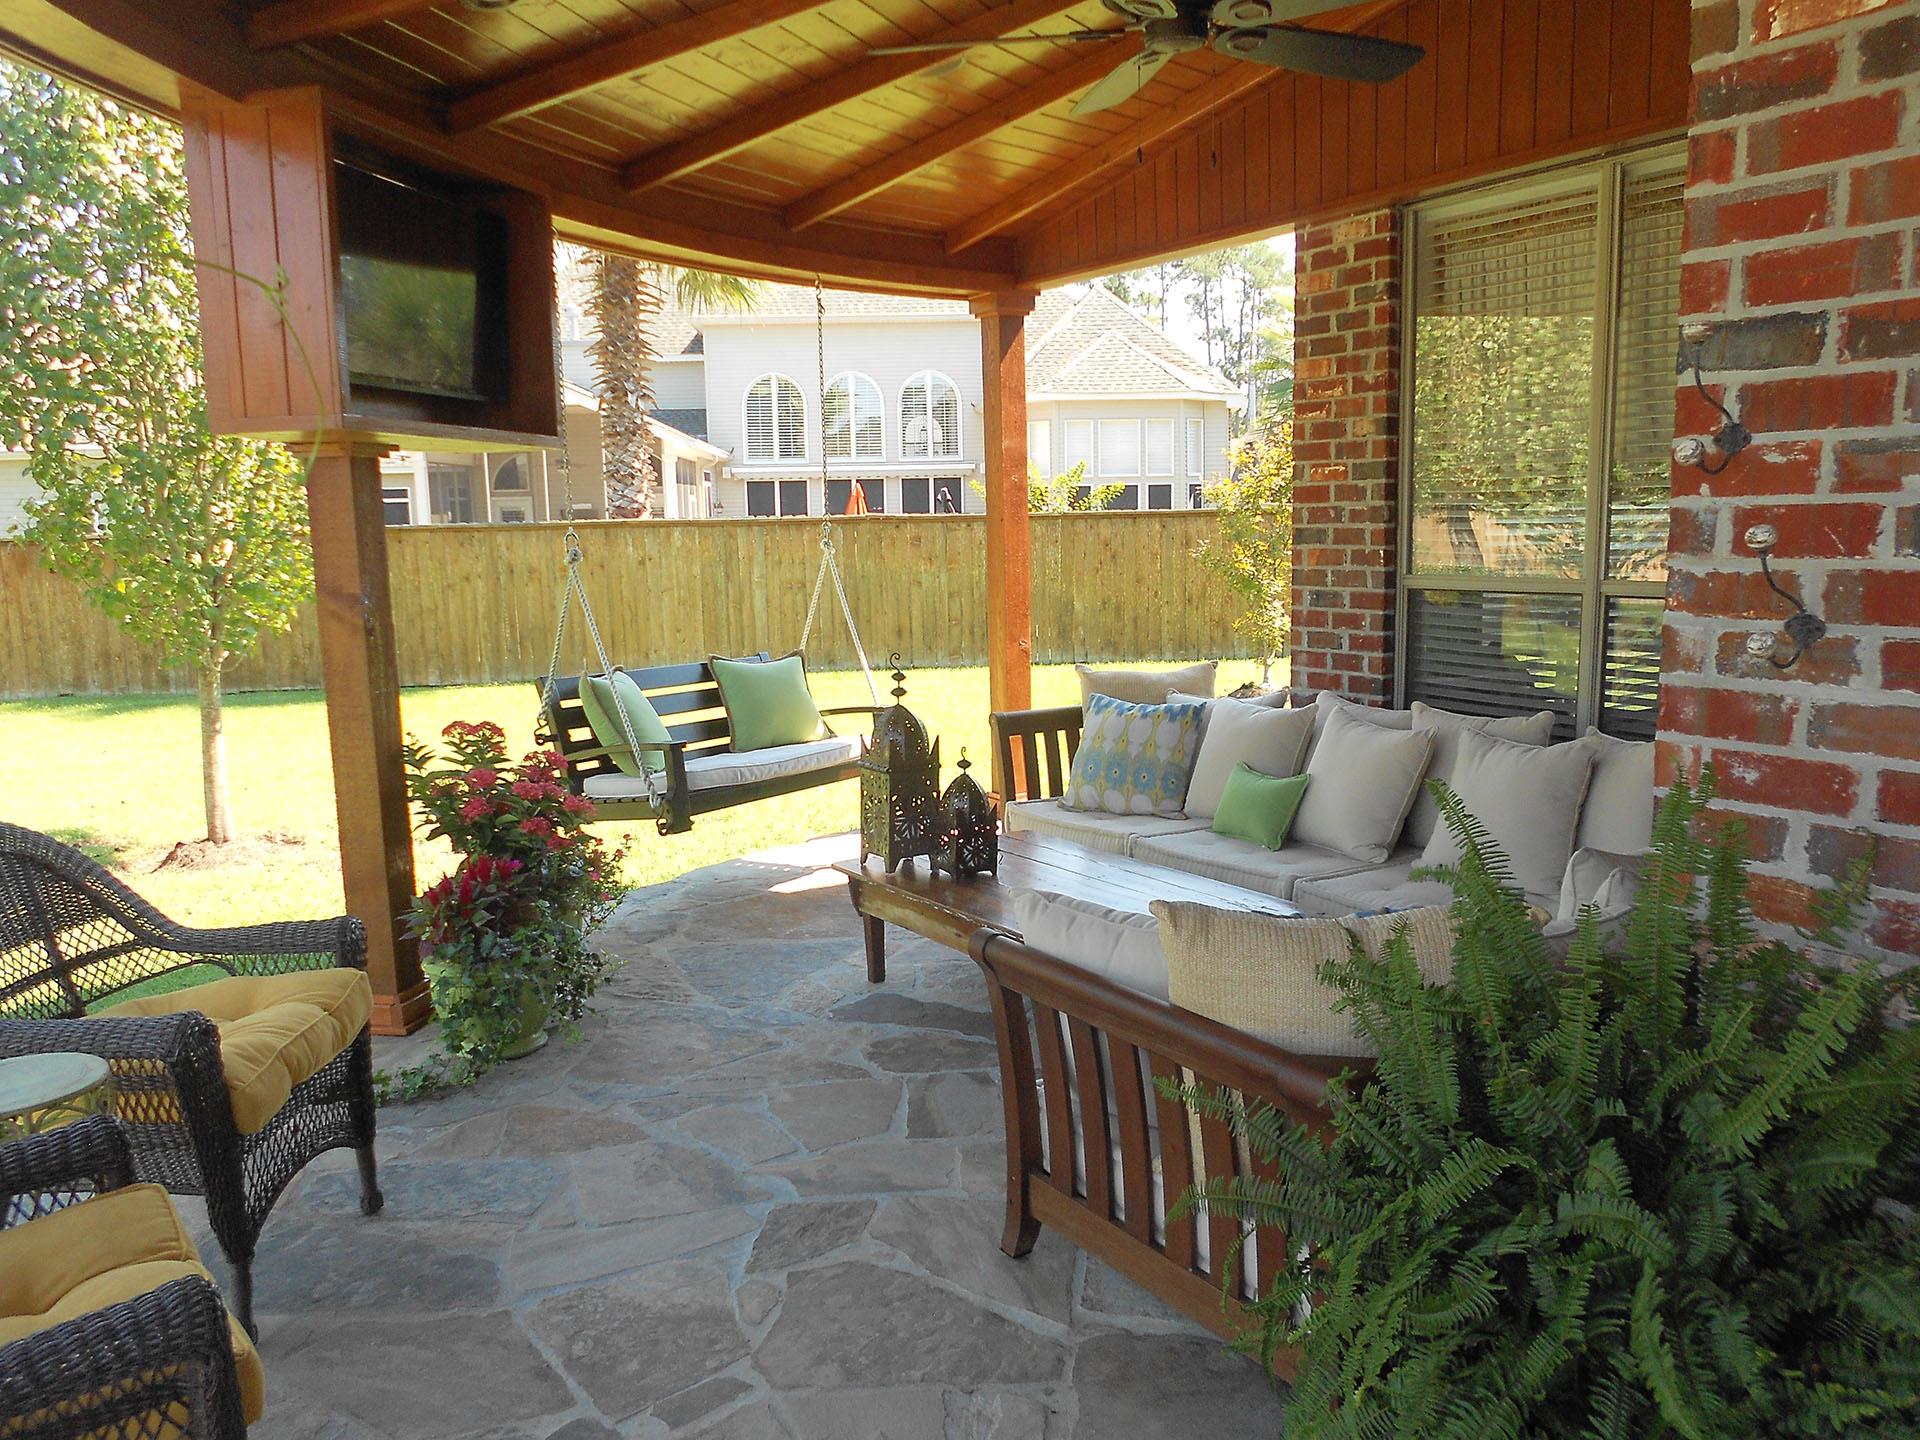 pavers custom outdoor concepts. Black Bedroom Furniture Sets. Home Design Ideas